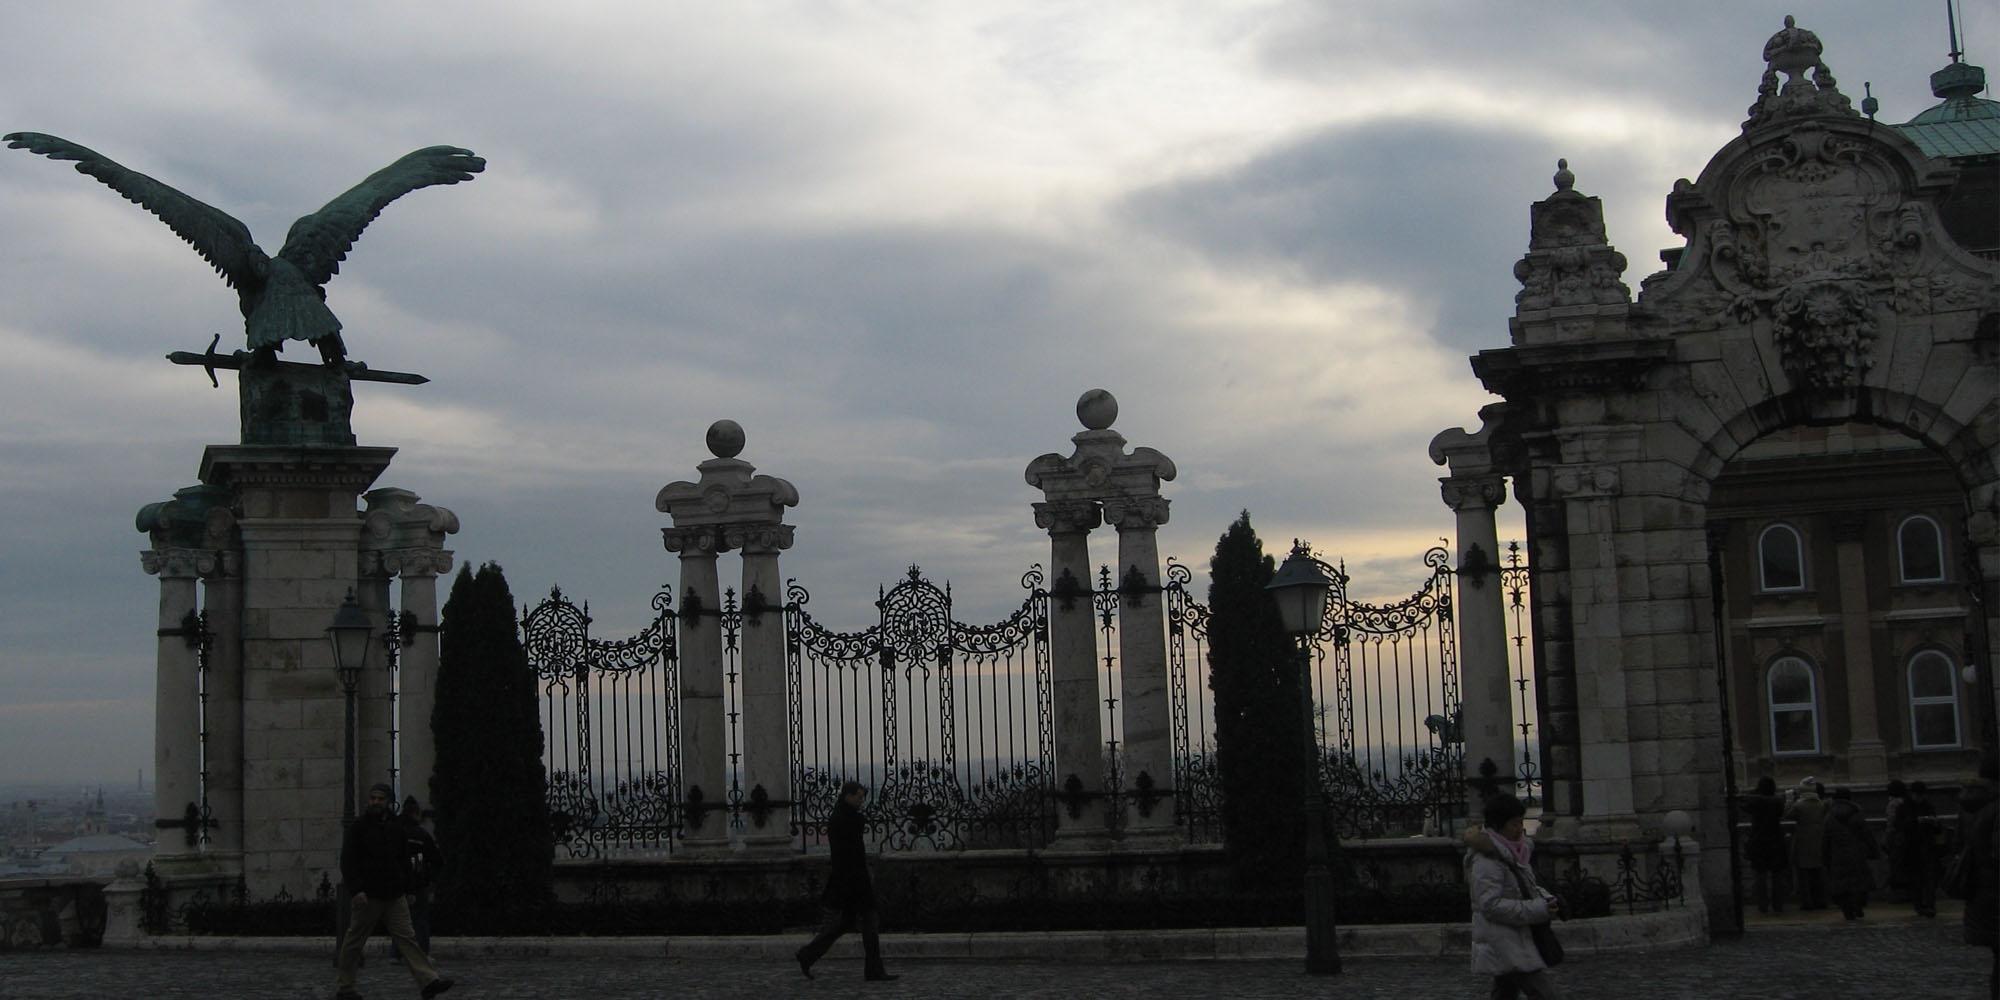 budapest-5-12-08.jpg